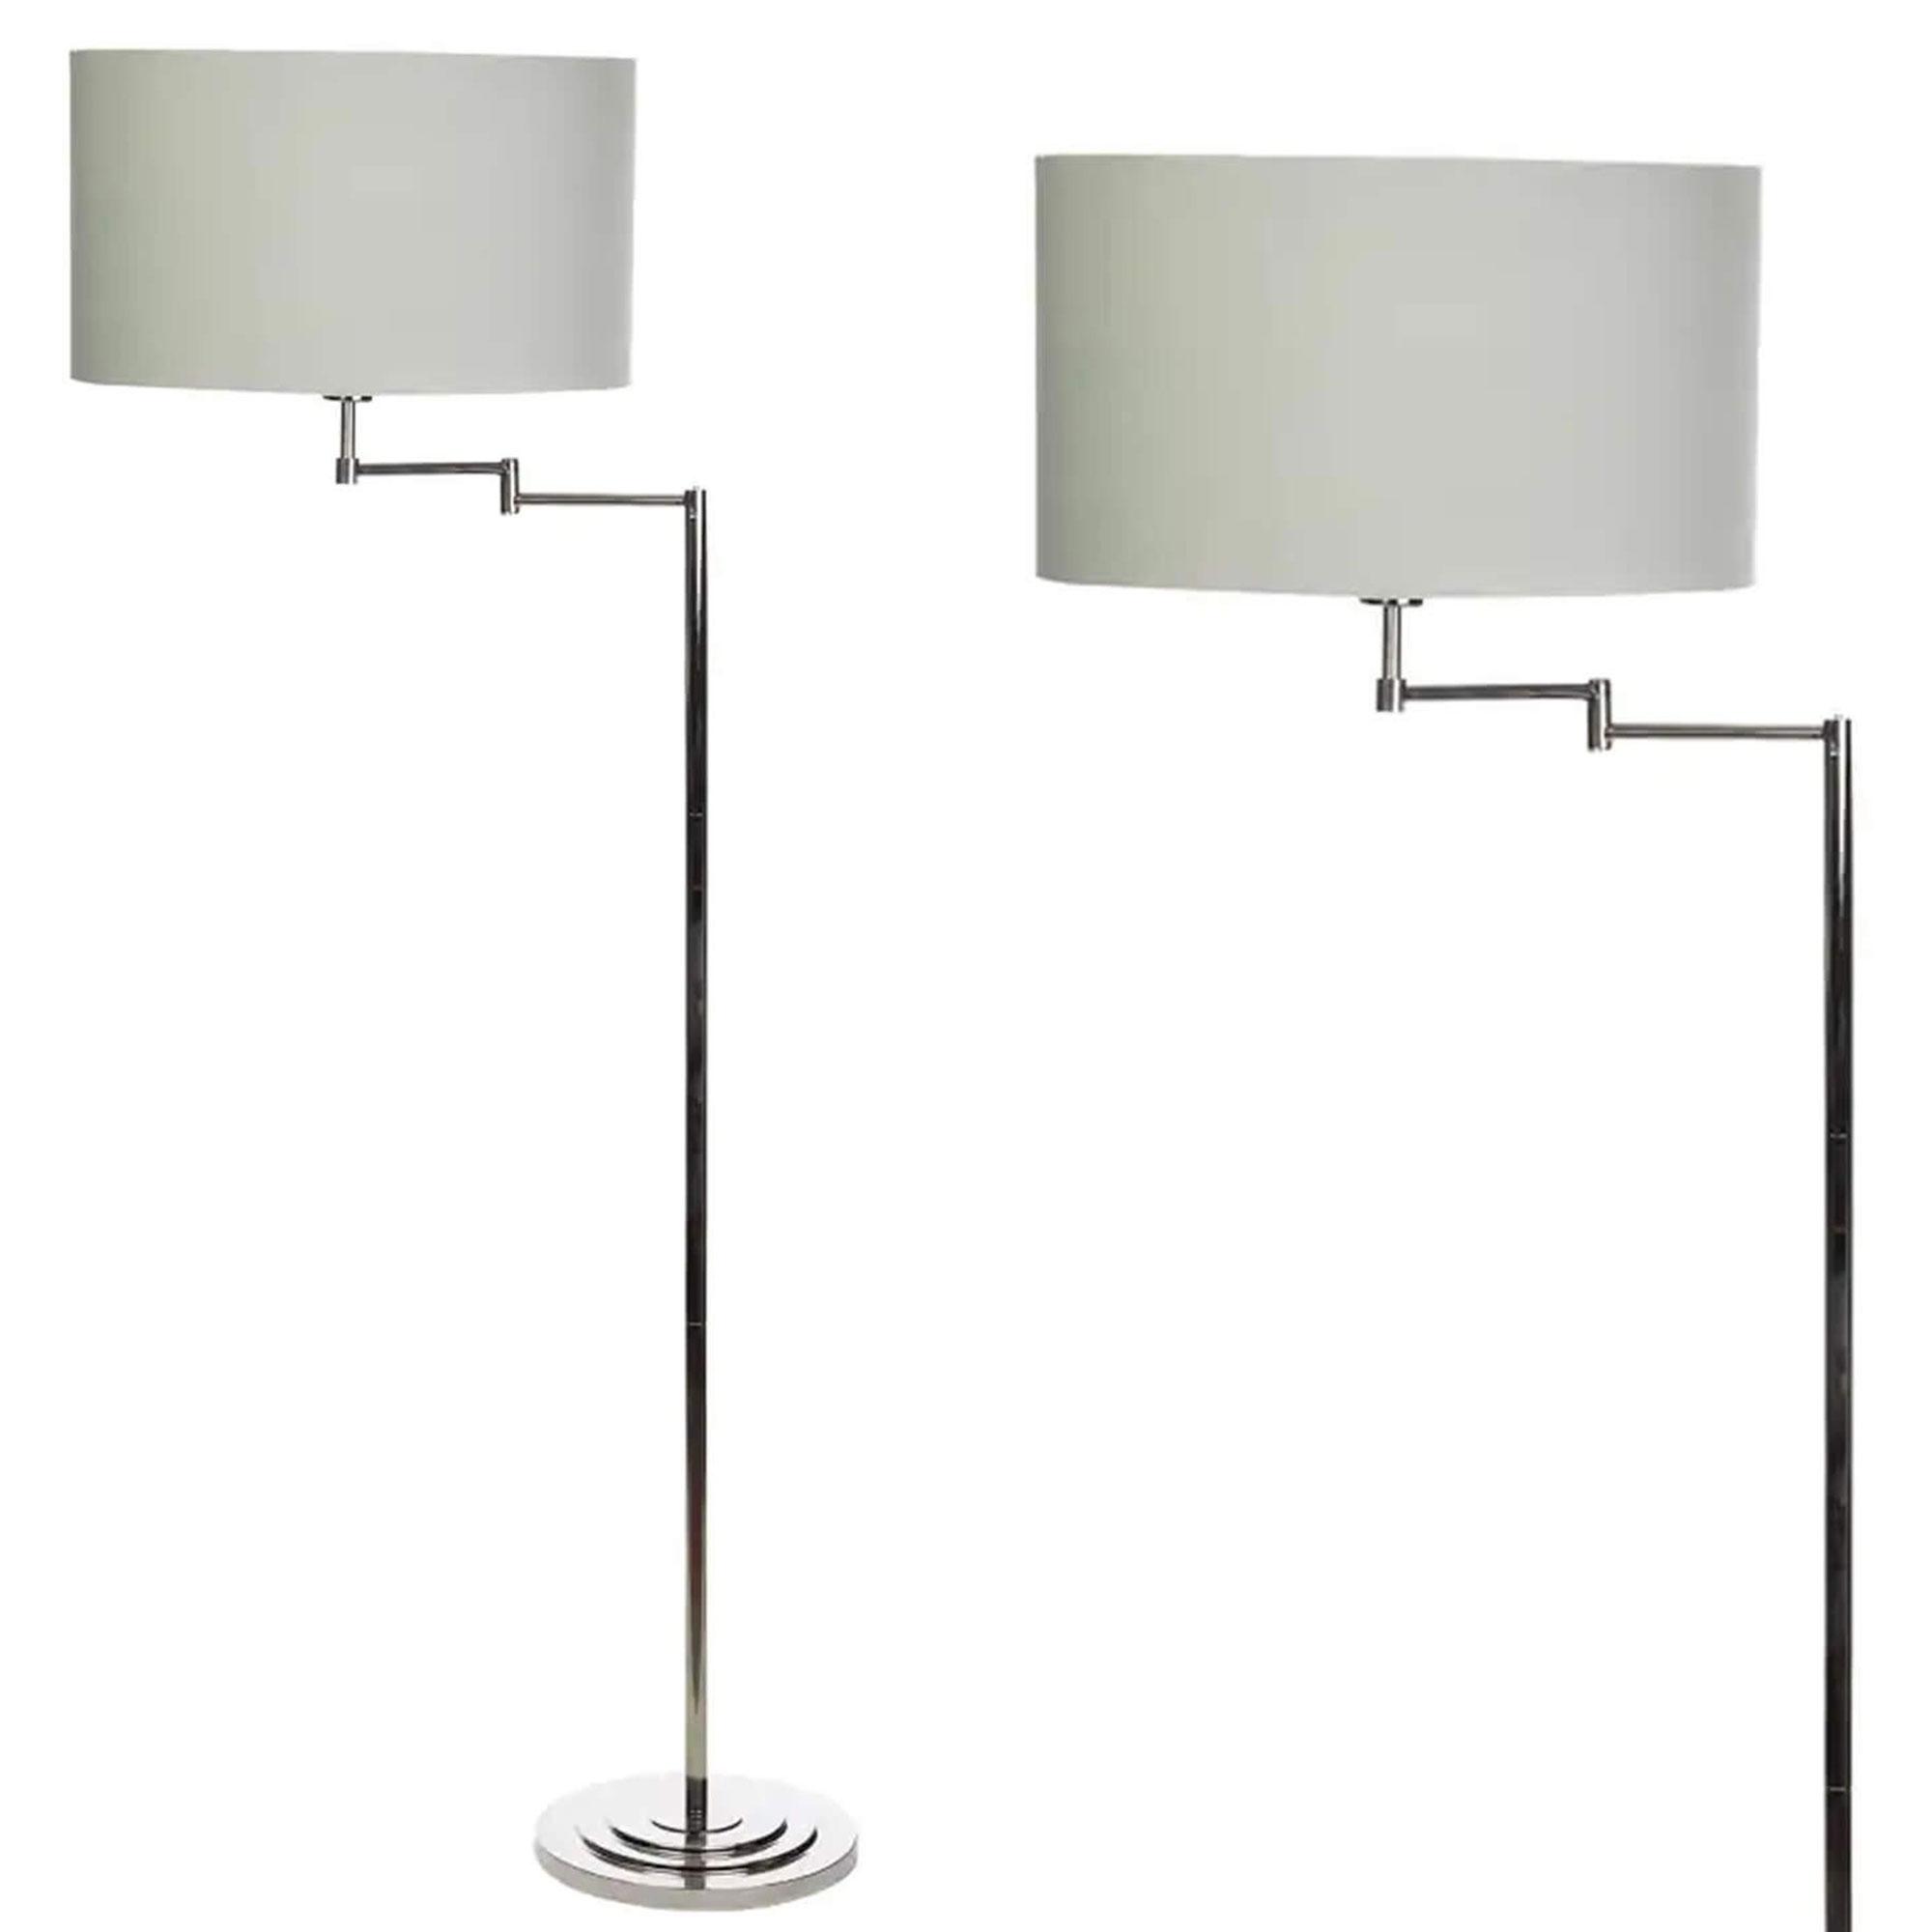 La Collection Marlowe Swing Arm Floor Lamp Polished Nickel Grey All Lighting Fishpools